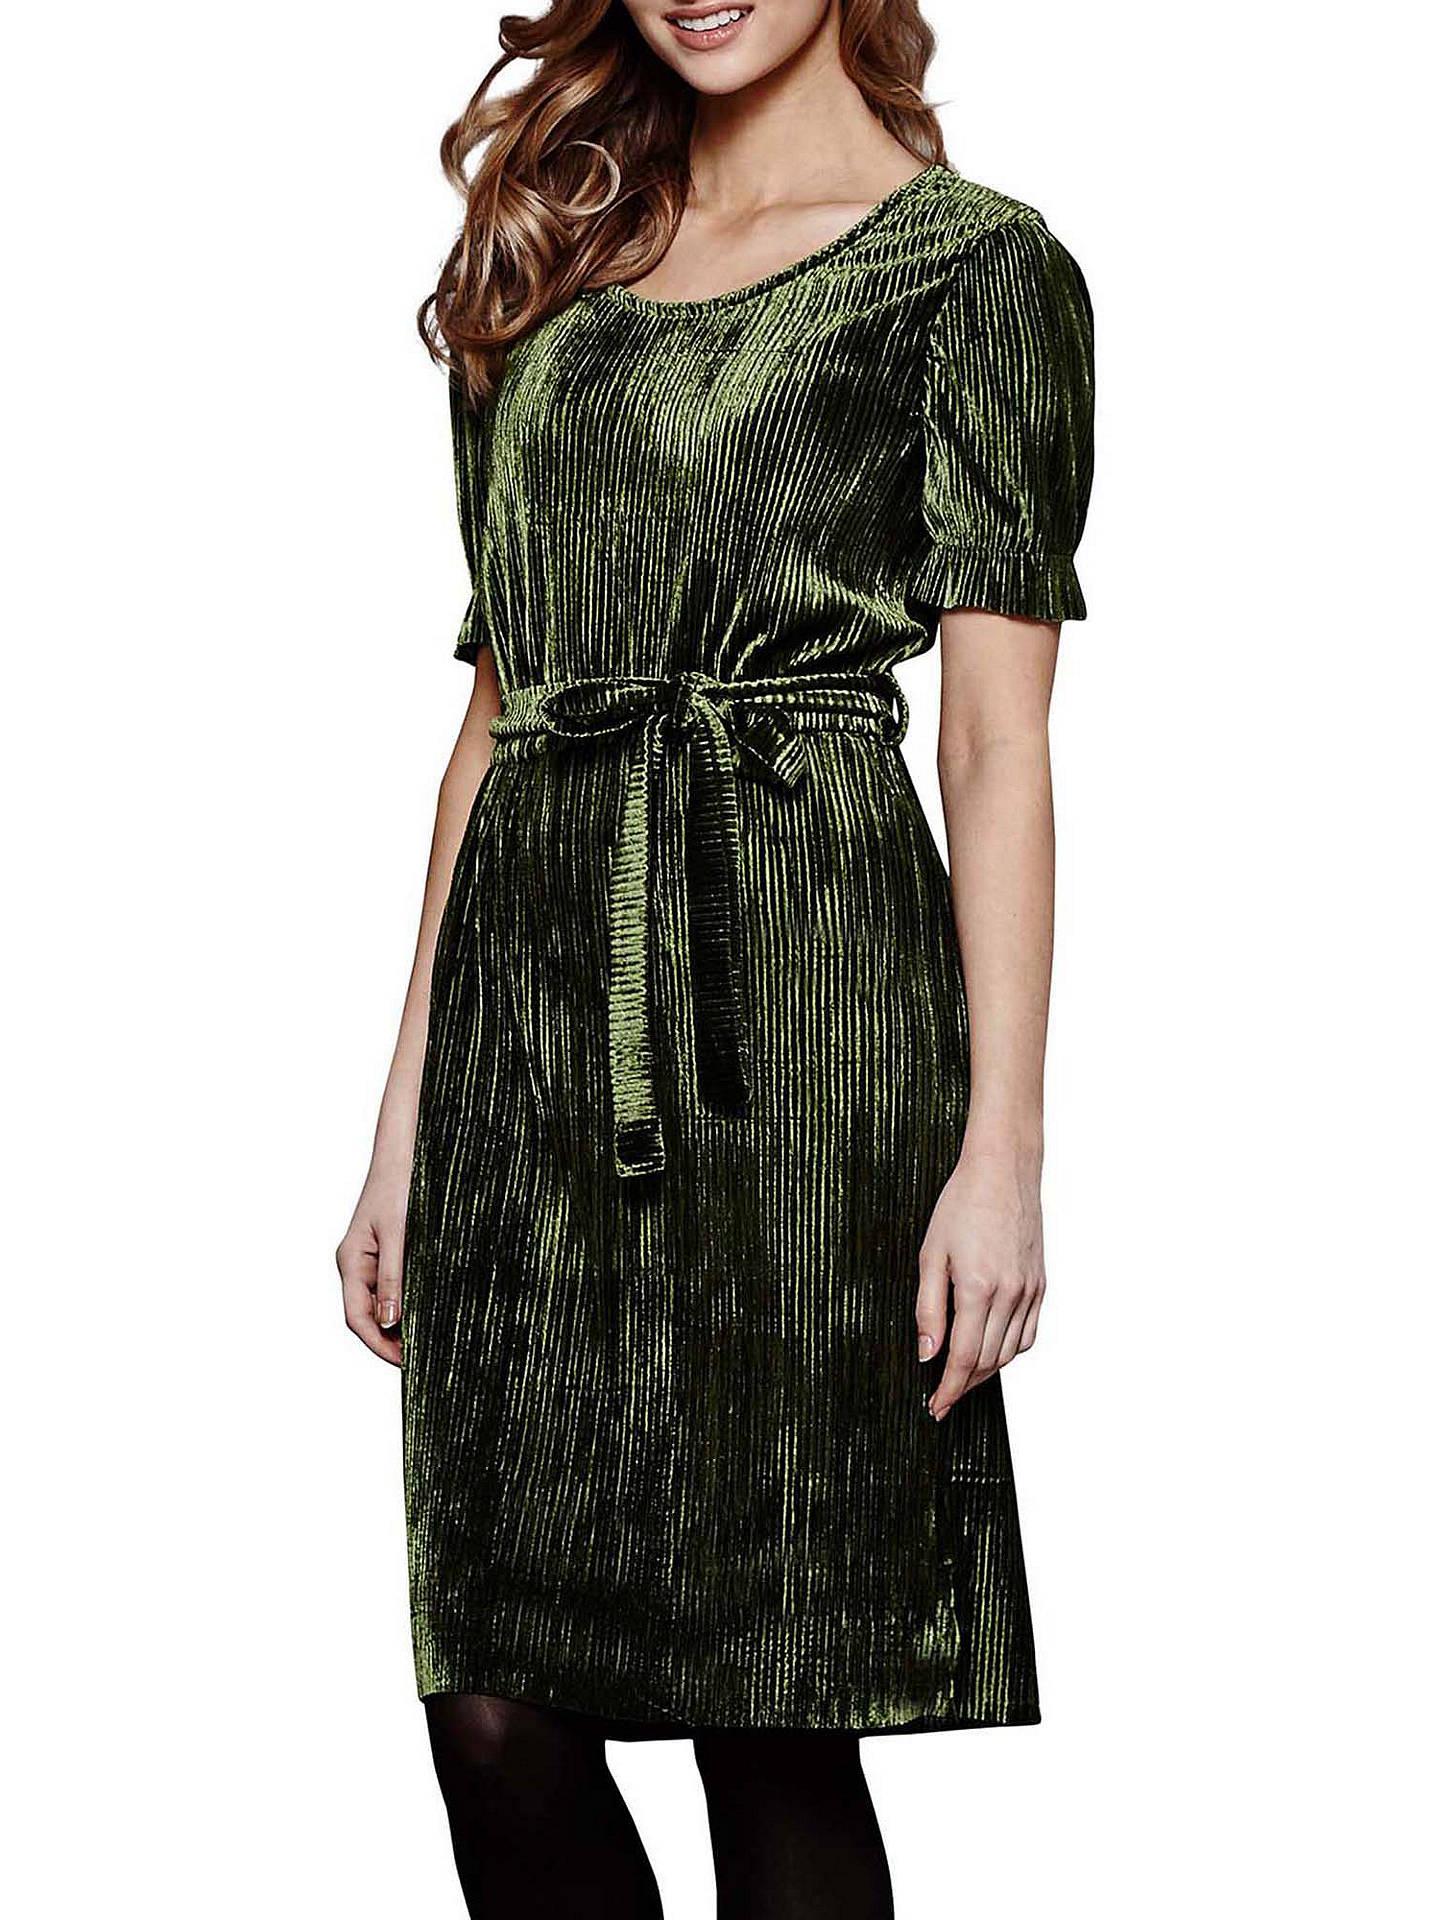 def42d7f7e638 Yumi Crinkled Dress, Olive Green at John Lewis & Partners